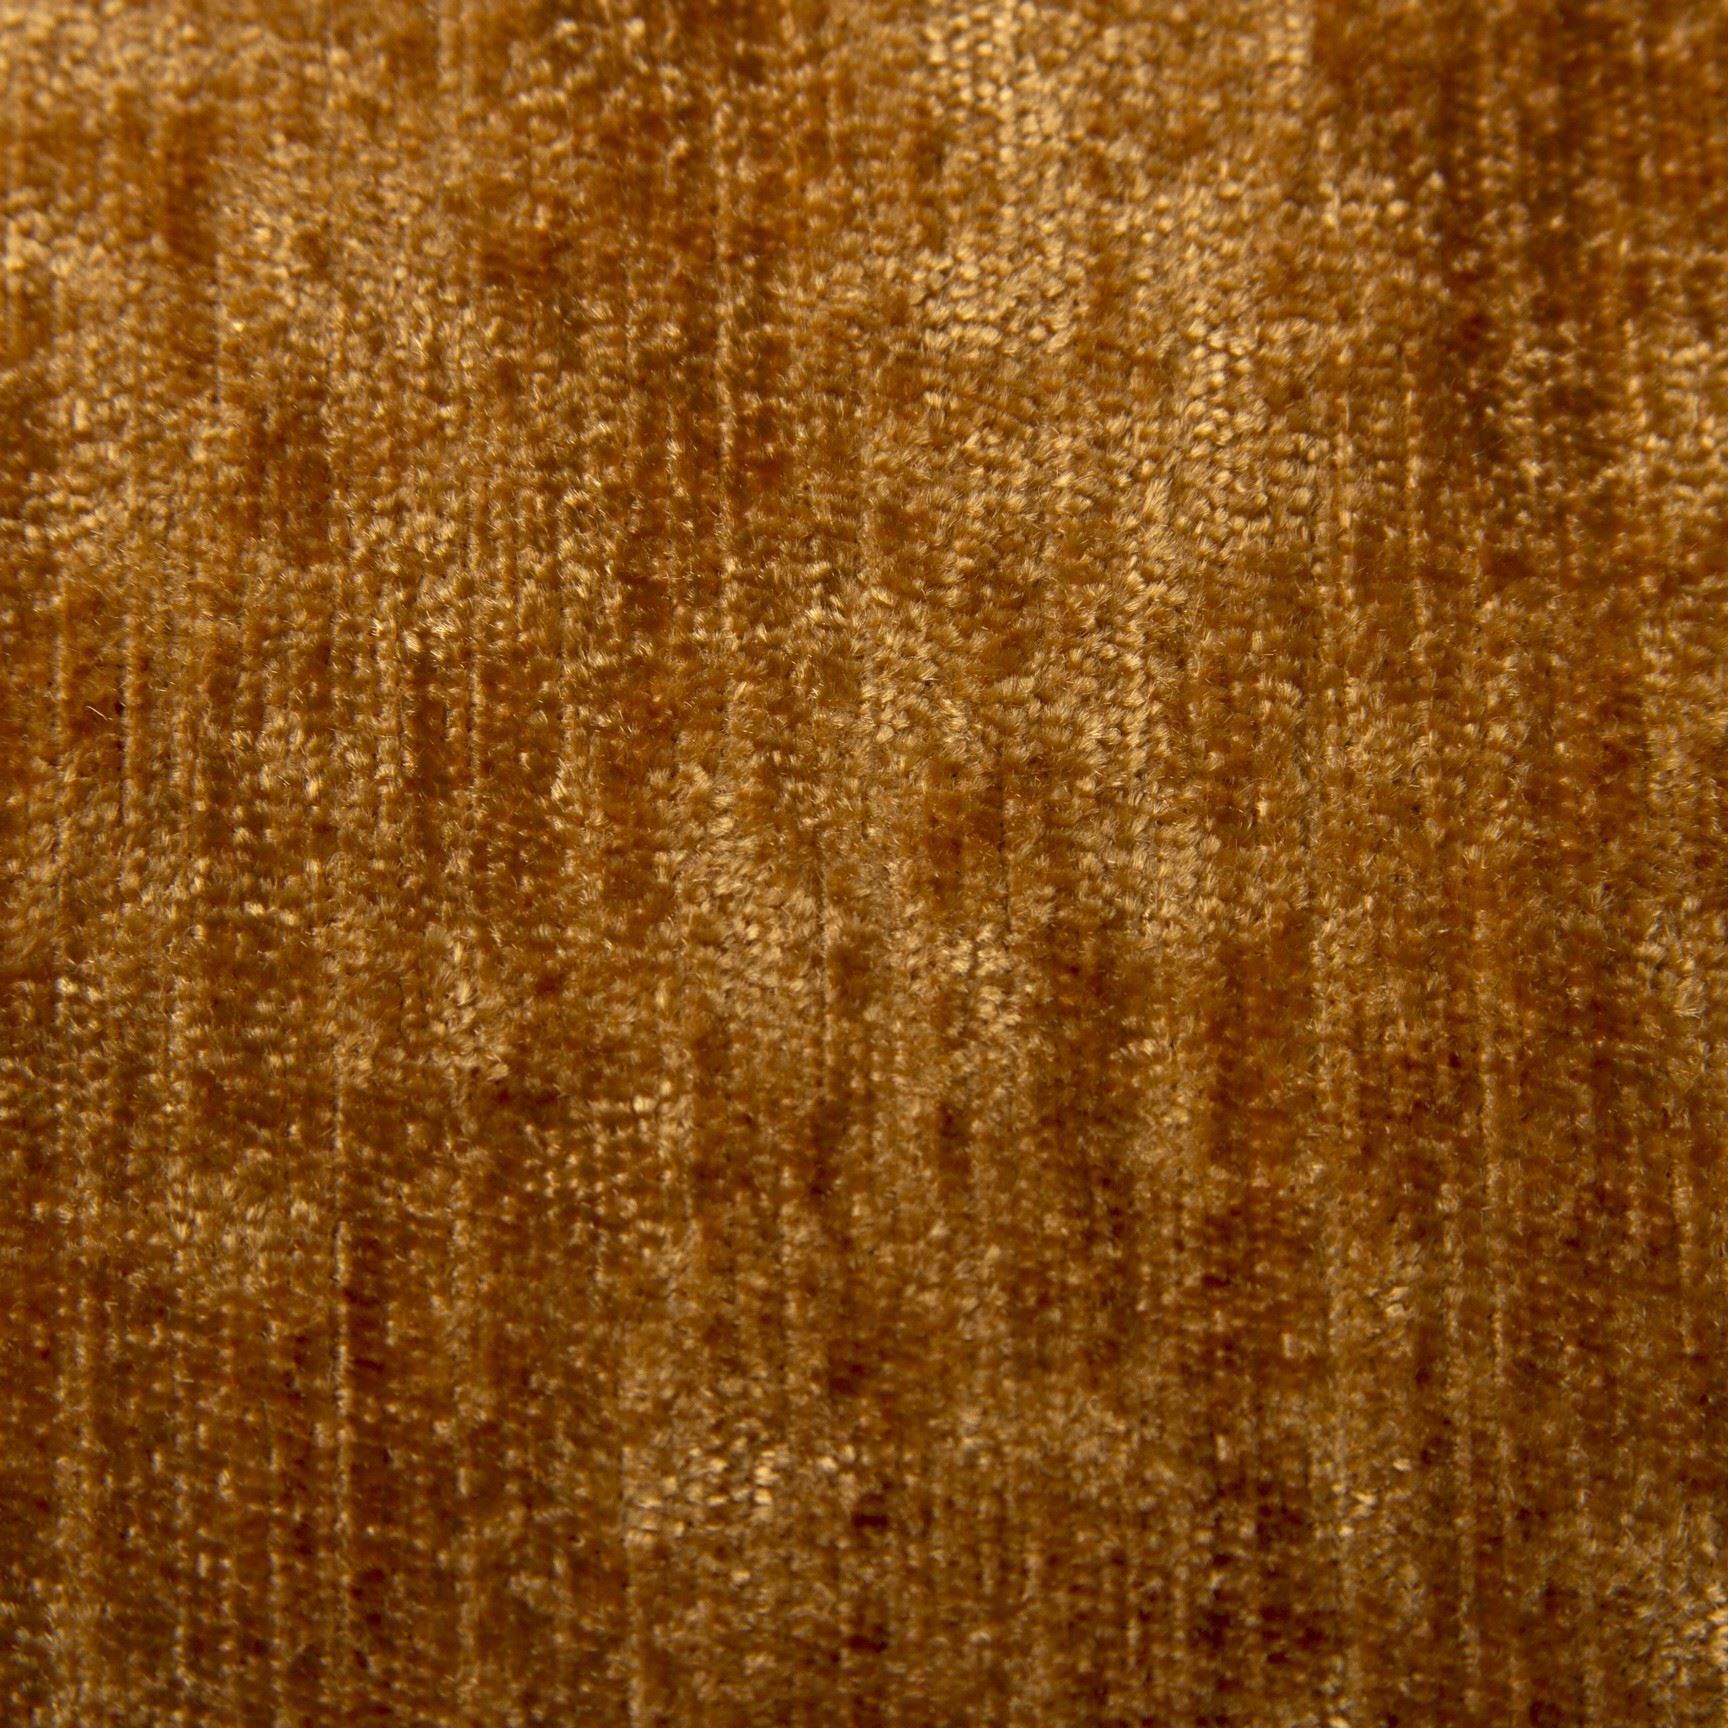 crushed velvet sofa fabric ava argos luxury plush satin super soft heavy weight